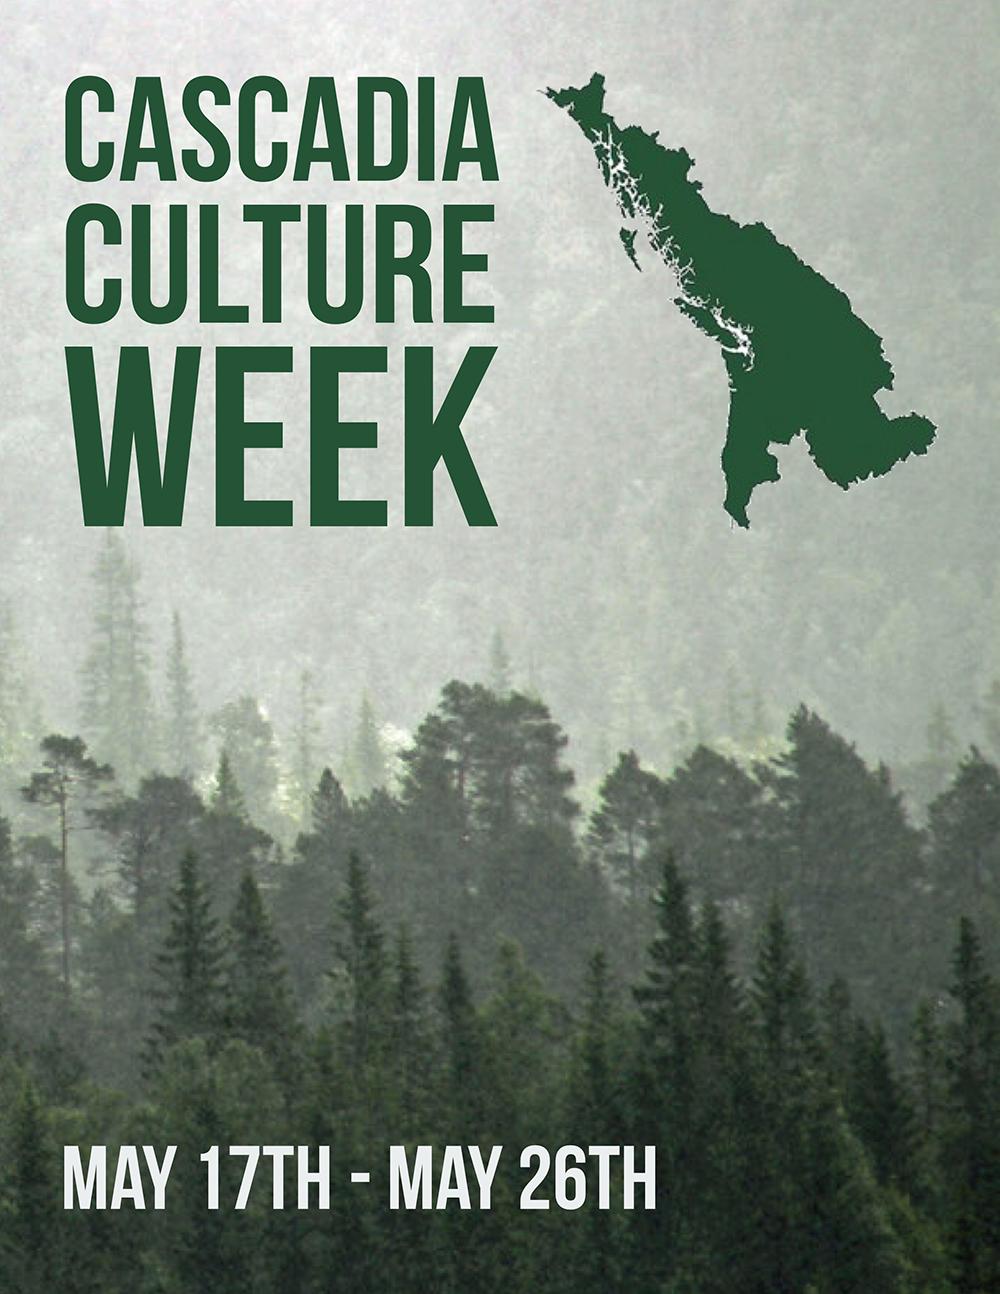 Cascadia Culture Week Poster.jpg